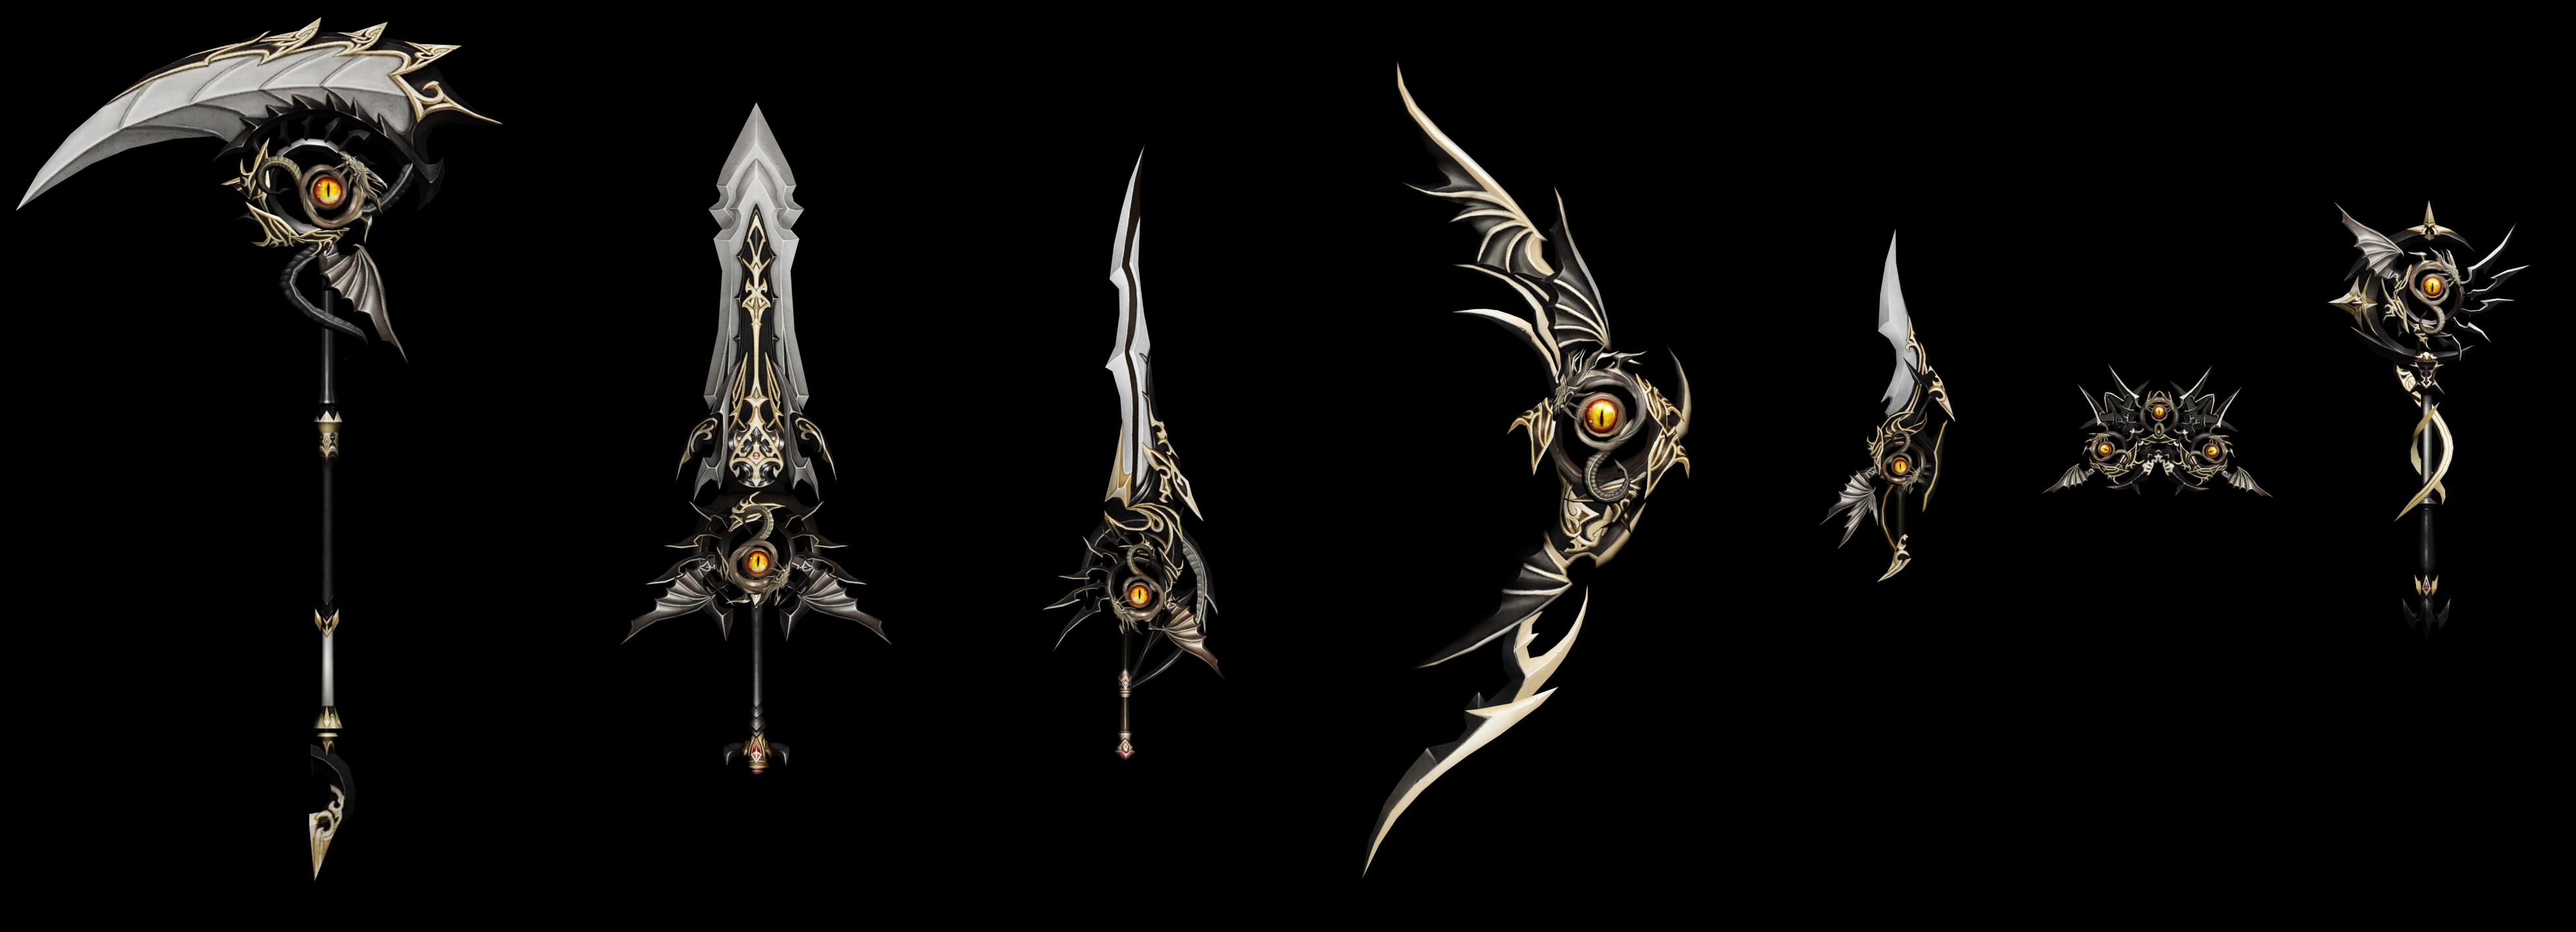 0-eyedragon